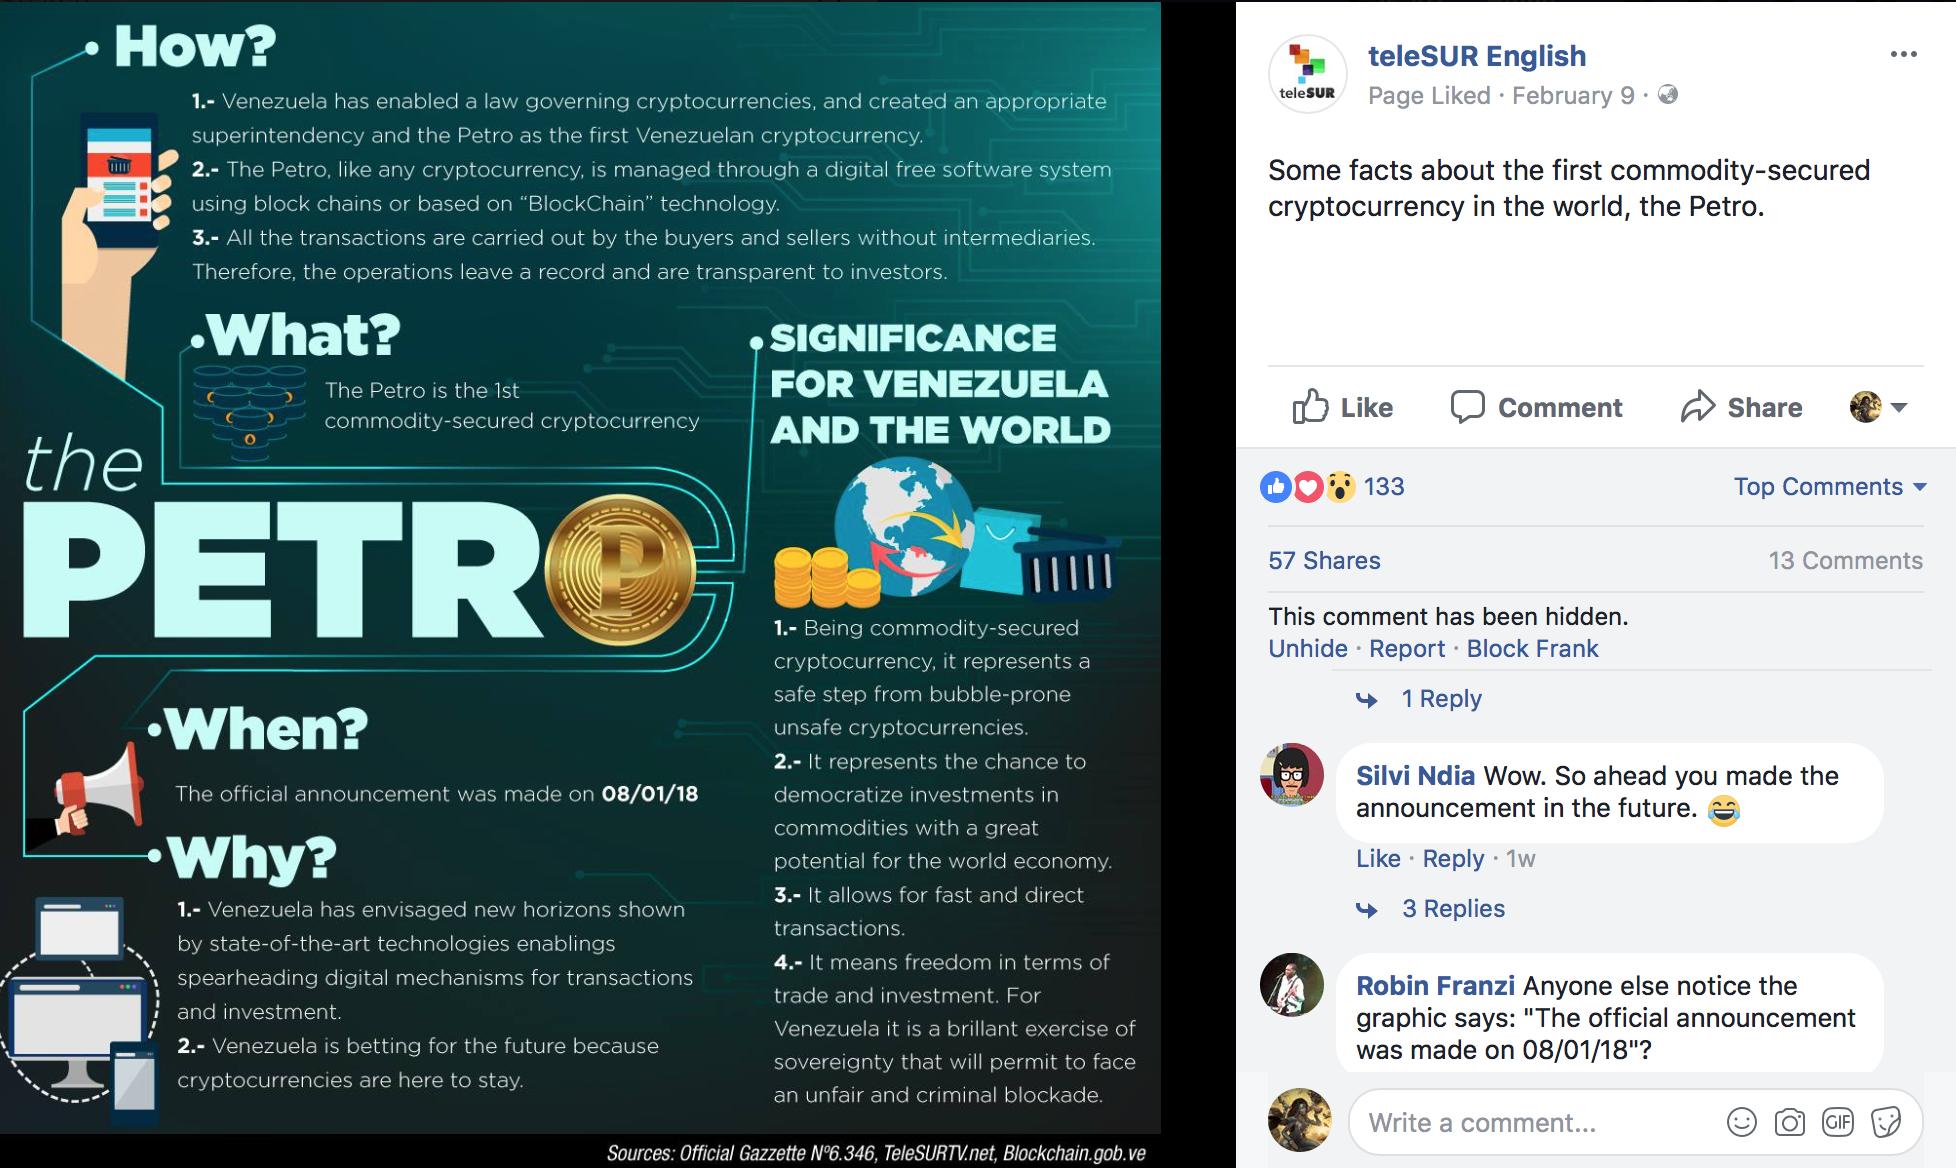 Venezuela ariel sheen telesur english infographic with incorrect information fandeluxe Gallery